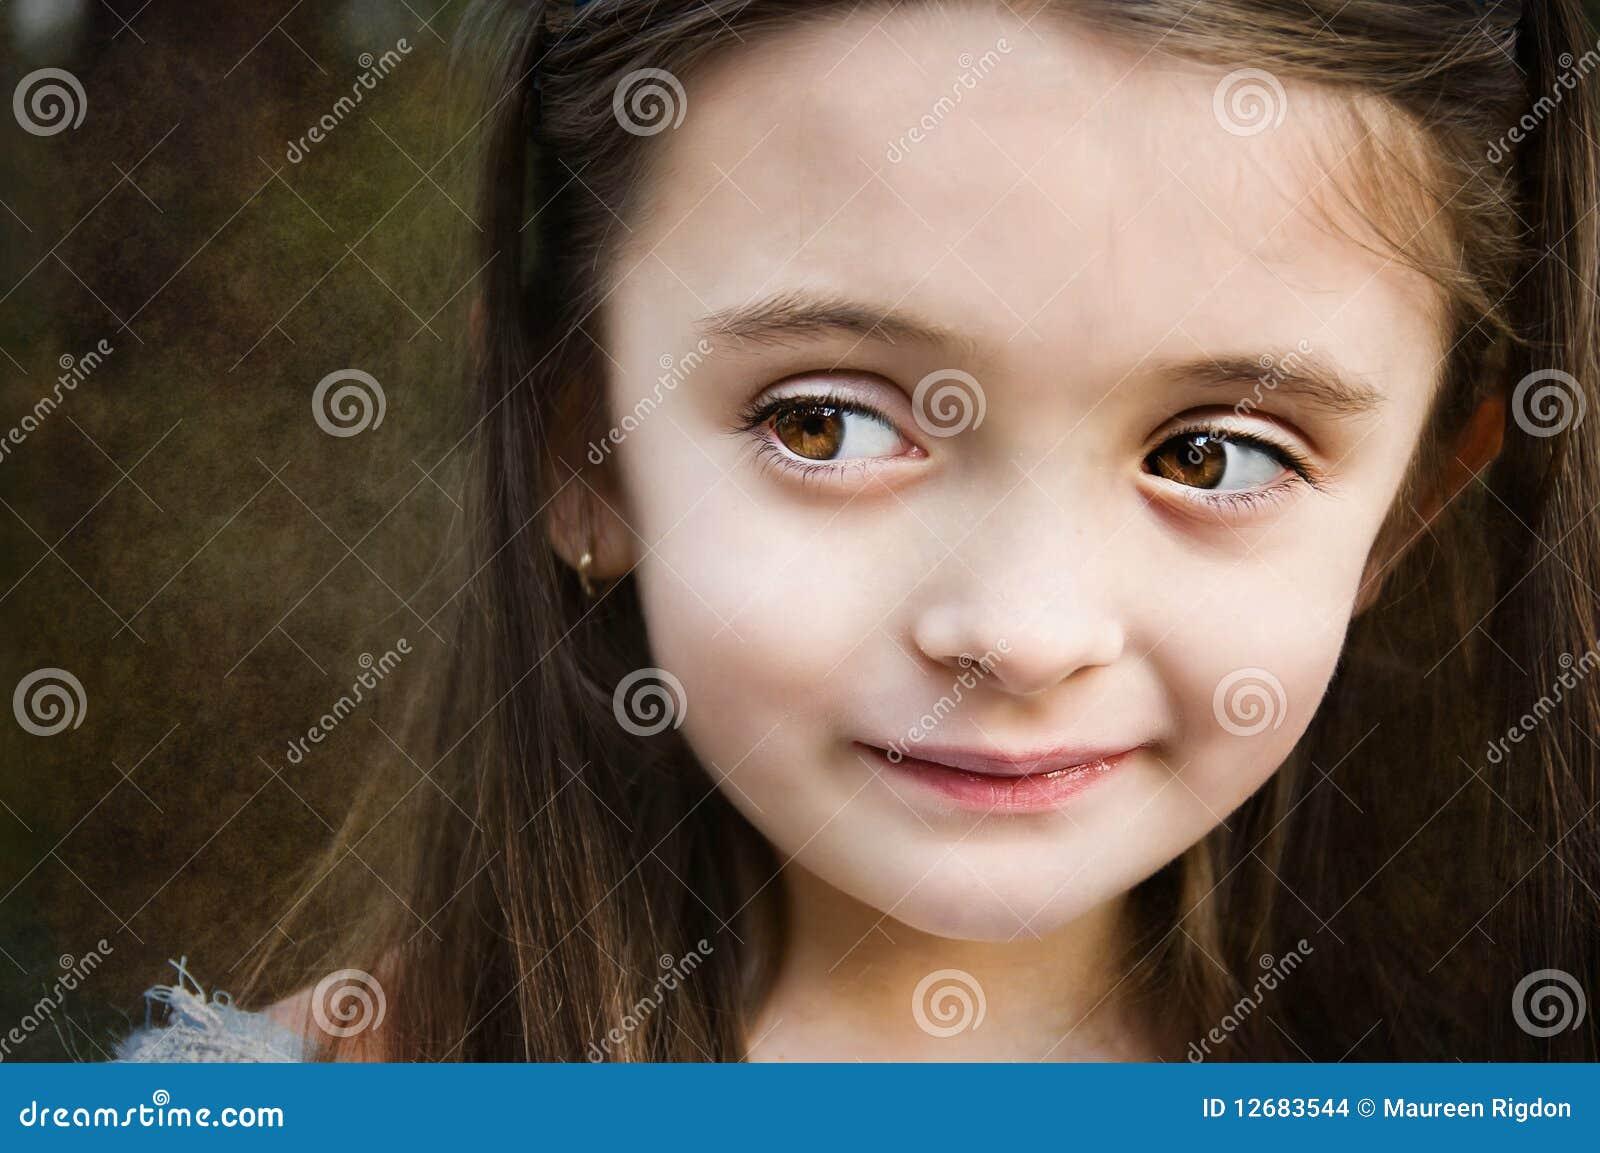 eyed facial Brown girl